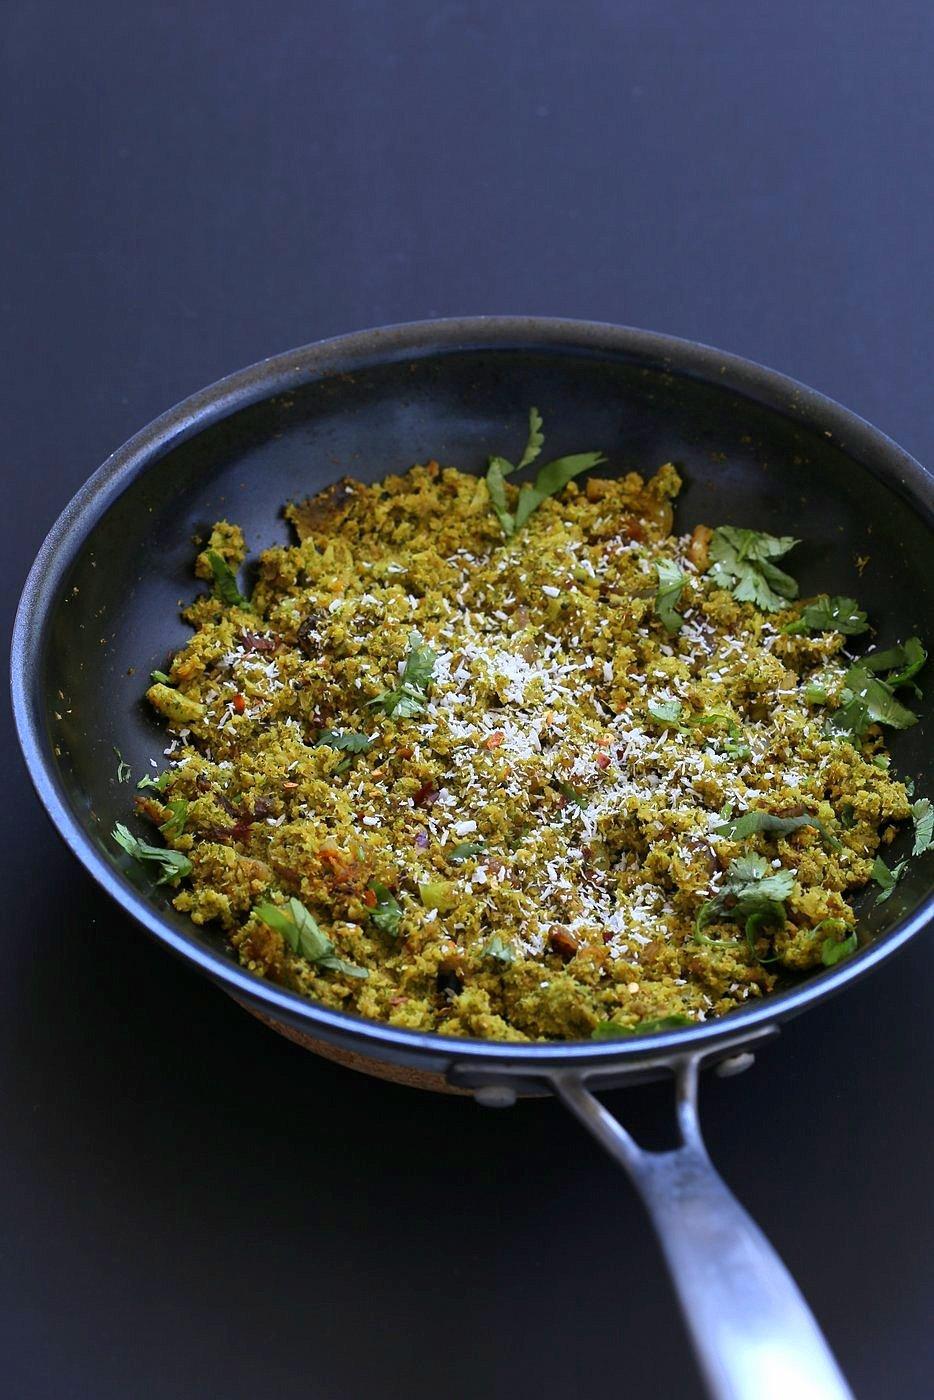 Broccoli stir fry with indian spices broccoli sabji vegan richa broccoli stir fry with indian spices broccoli sabji with mustard seeds coriander fenugreek forumfinder Gallery